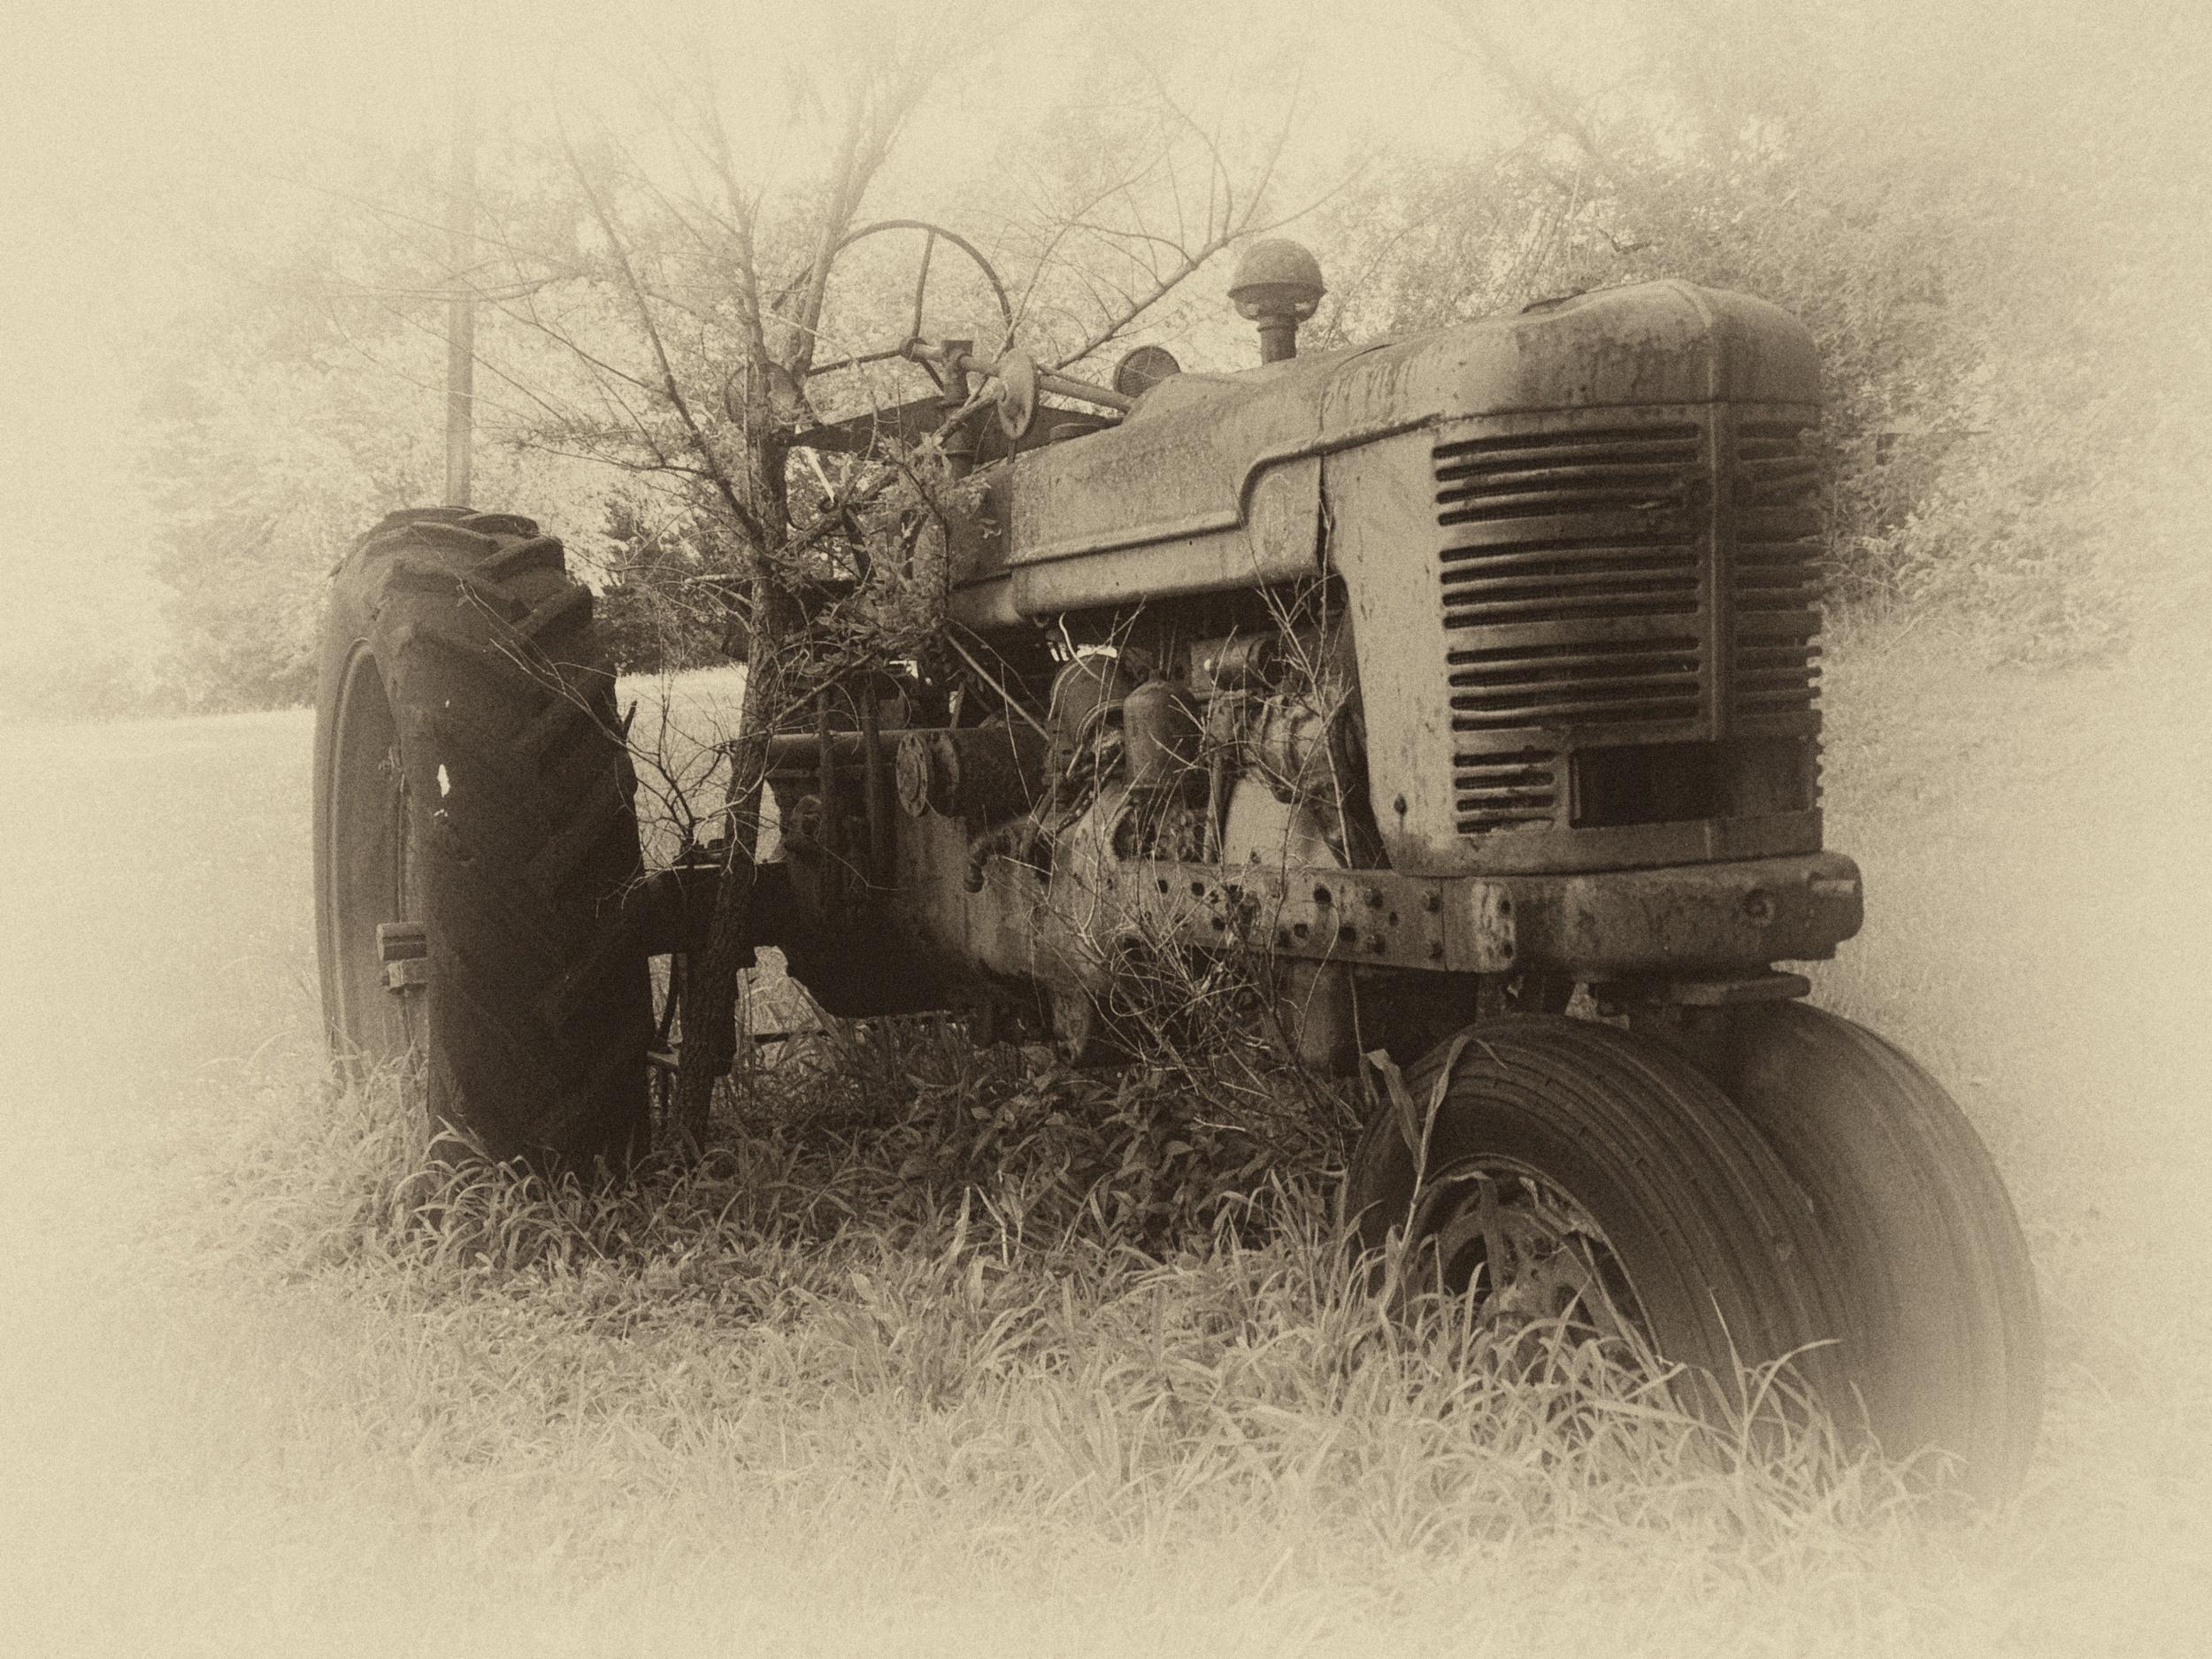 tractor4.jpg